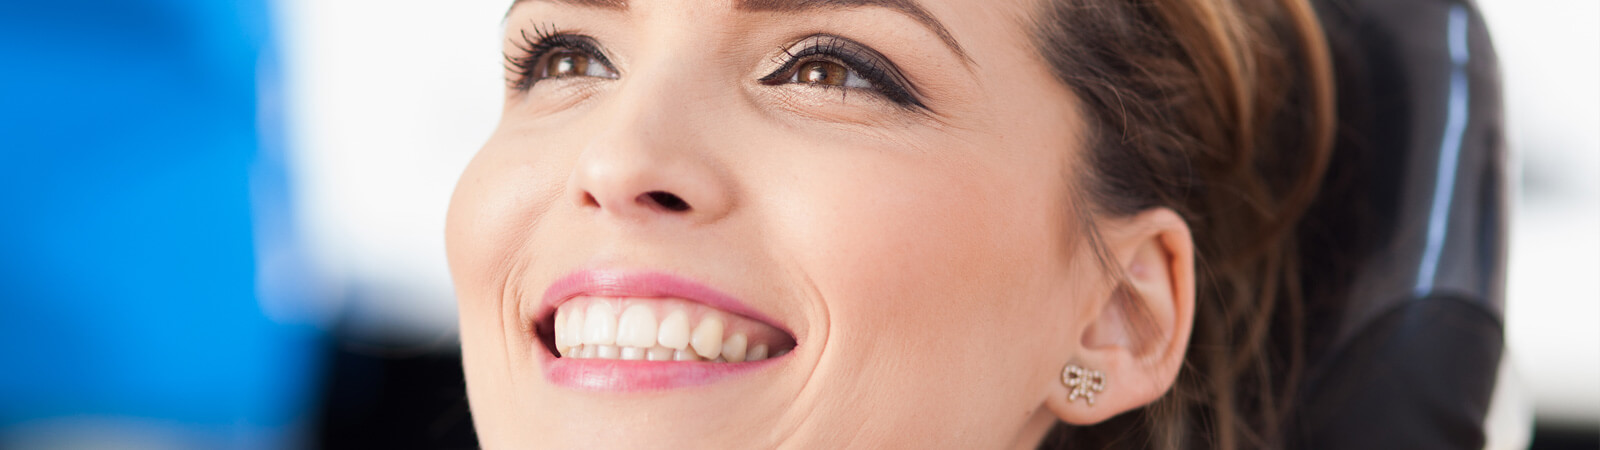 Dental Implants - Vivid Dental, Houston TX